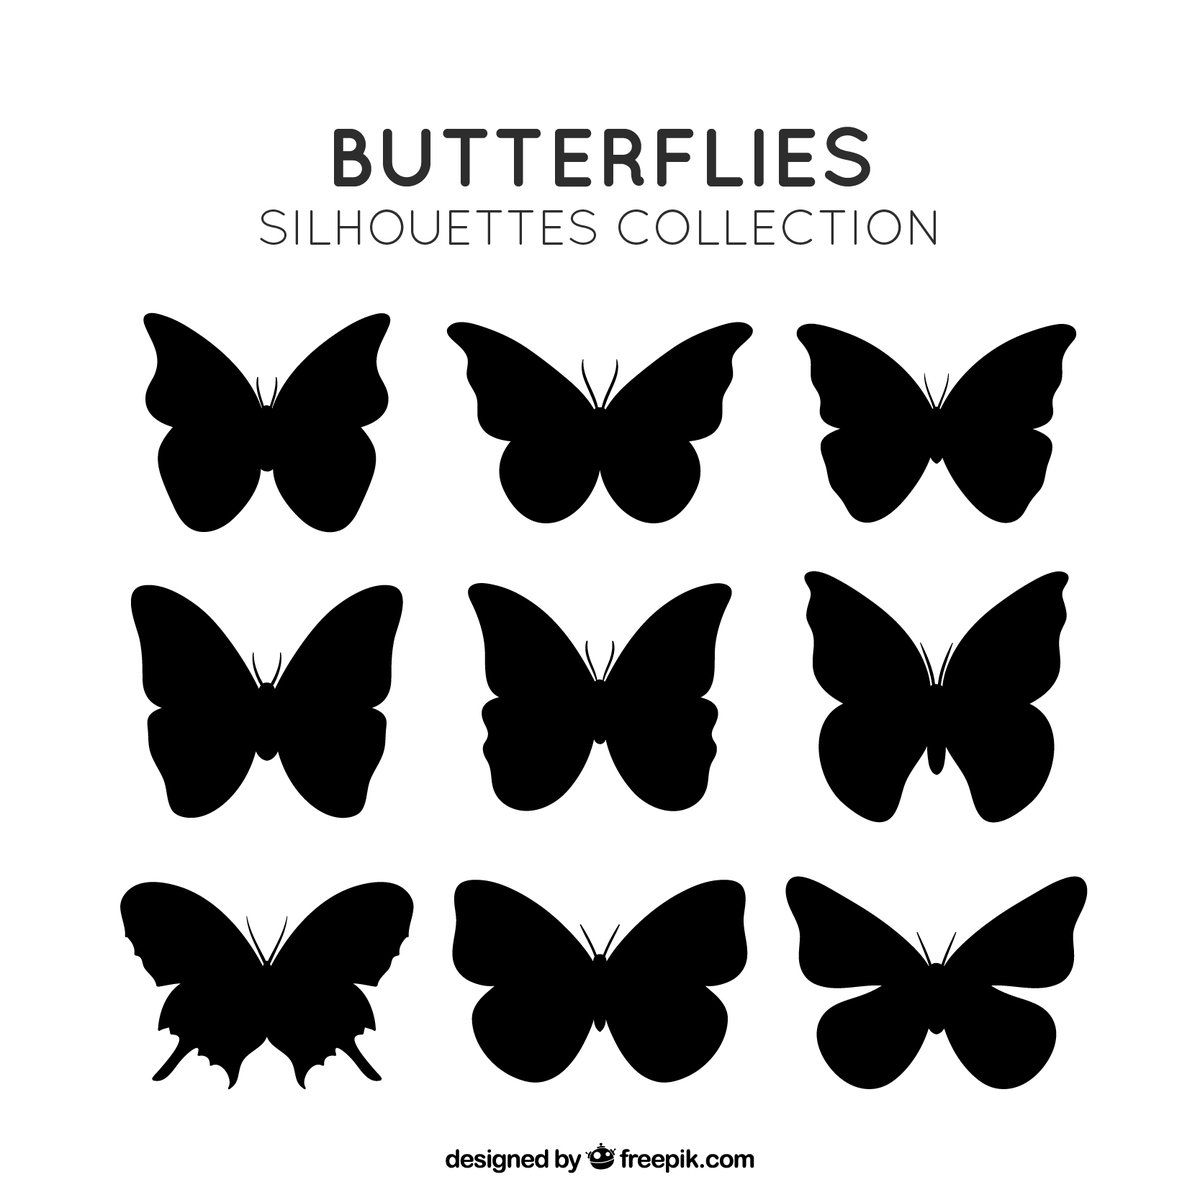 C9ogd9qxcaavhck Jpg 1200 1200 Silhouette Butterfly Butterfly Clip Art Silhouette Images